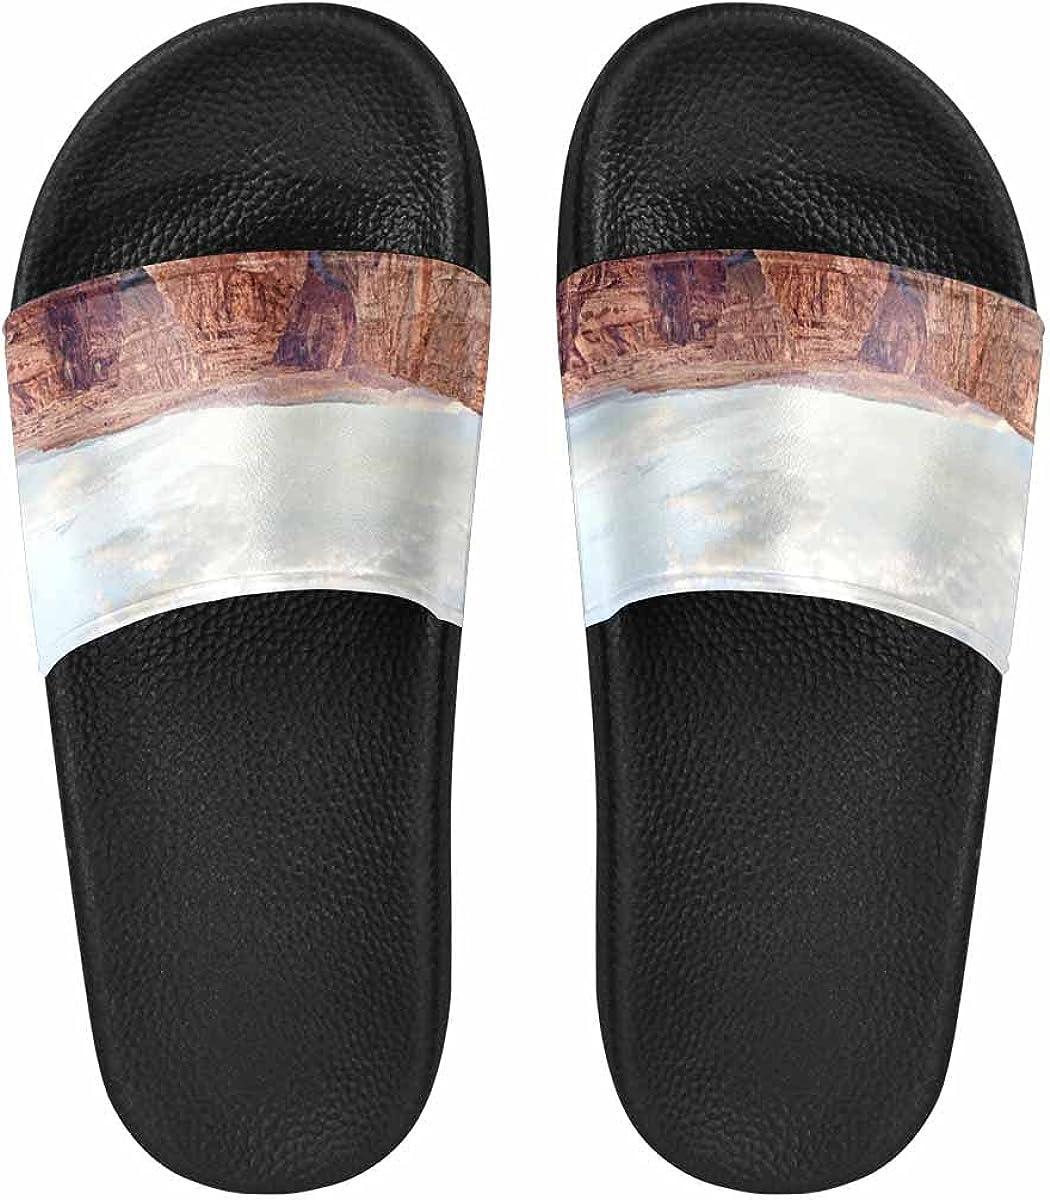 InterestPrint Hawksbill Turtle, Ocean Coral Reef Women's Slide Sandal Summer Beach Travel Sandal Indoor Shoes